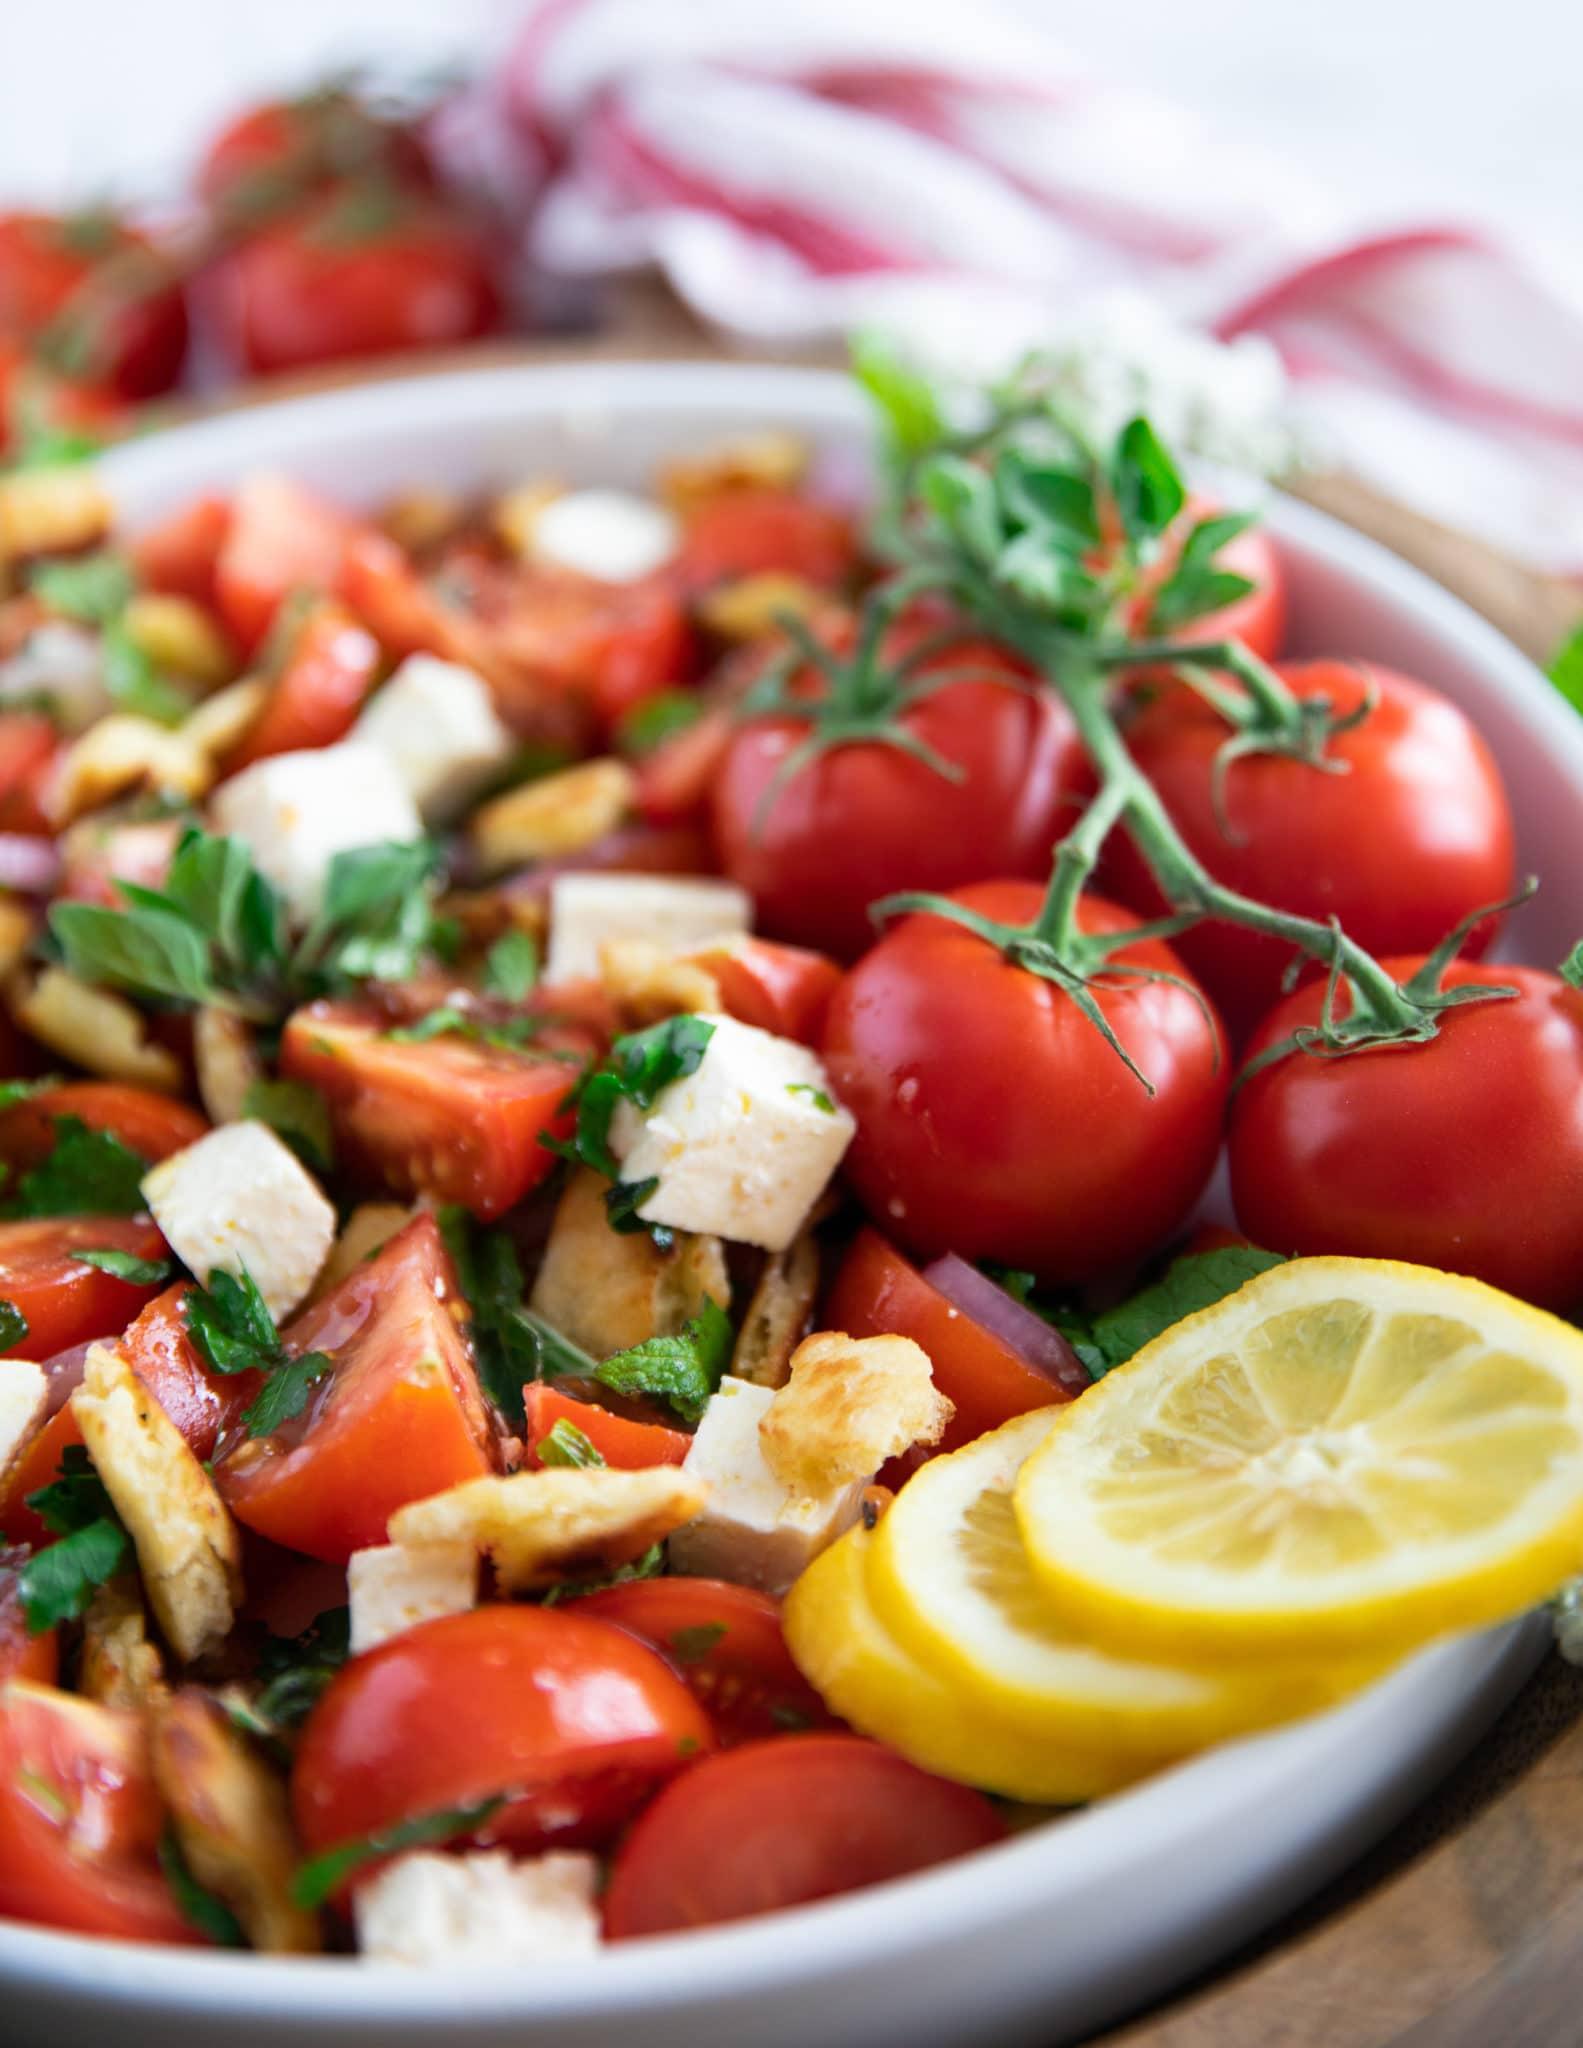 close up of a tomato salad showing the fresh mint, oregano, bread, feta and lemon slices